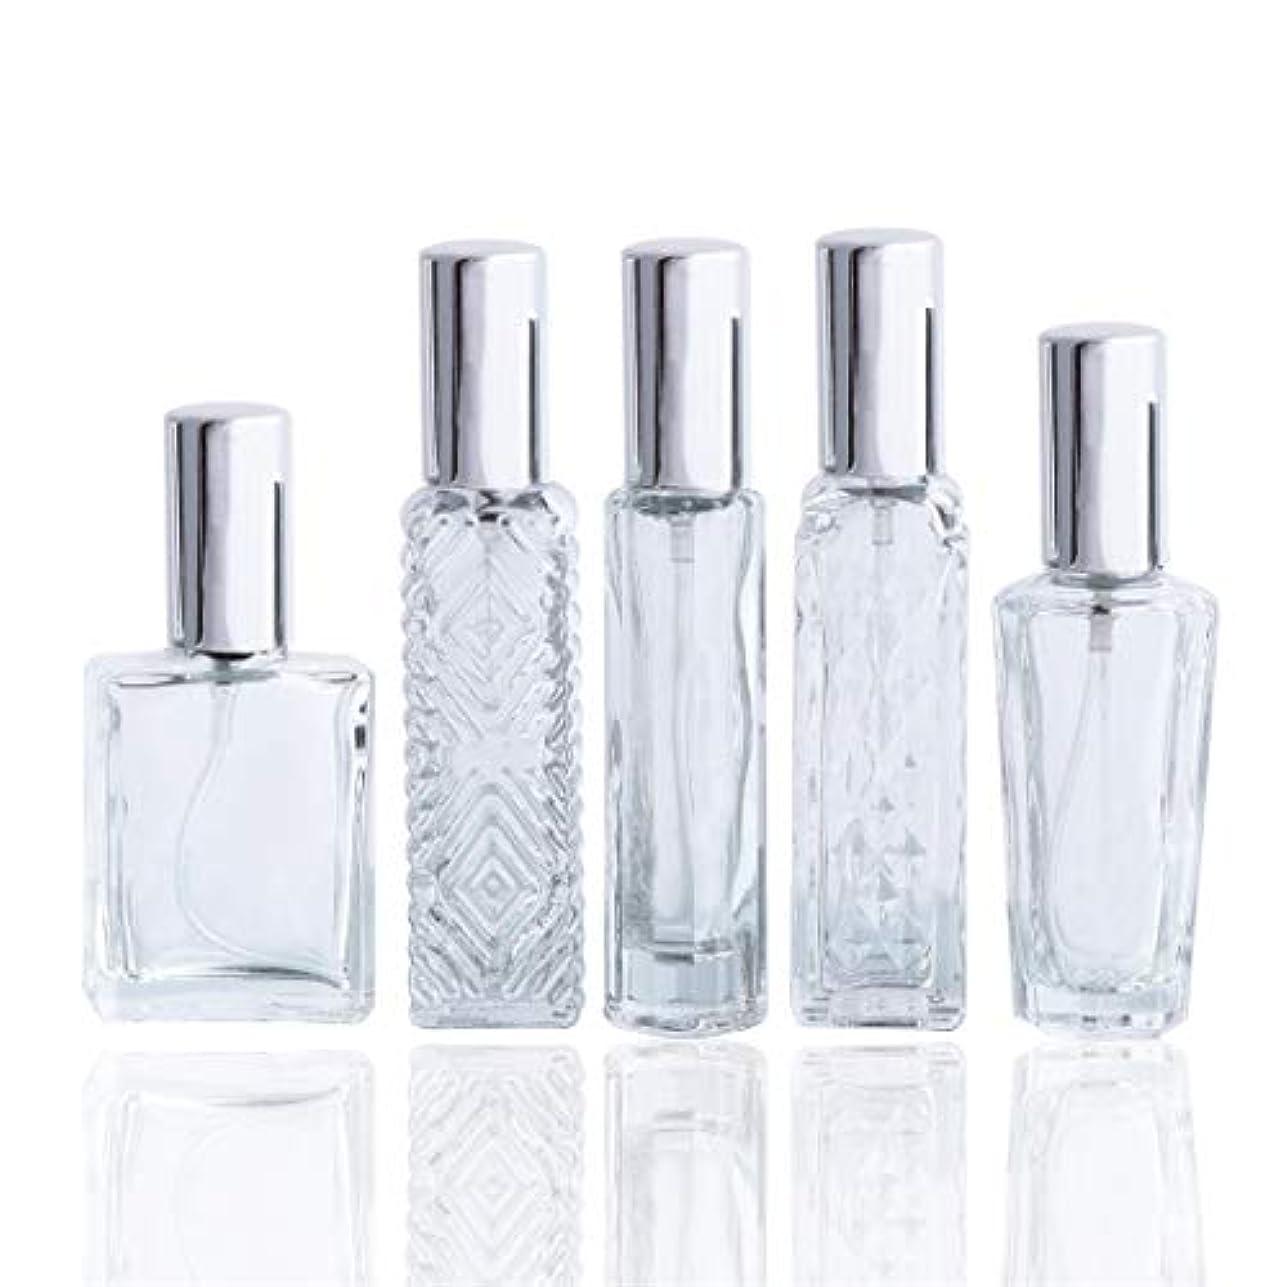 Waltz&Fクリアガラススプレー香水瓶 空きフレグランスボトル詰替用瓶アトマイザー分け瓶 旅行用品 化粧水用瓶